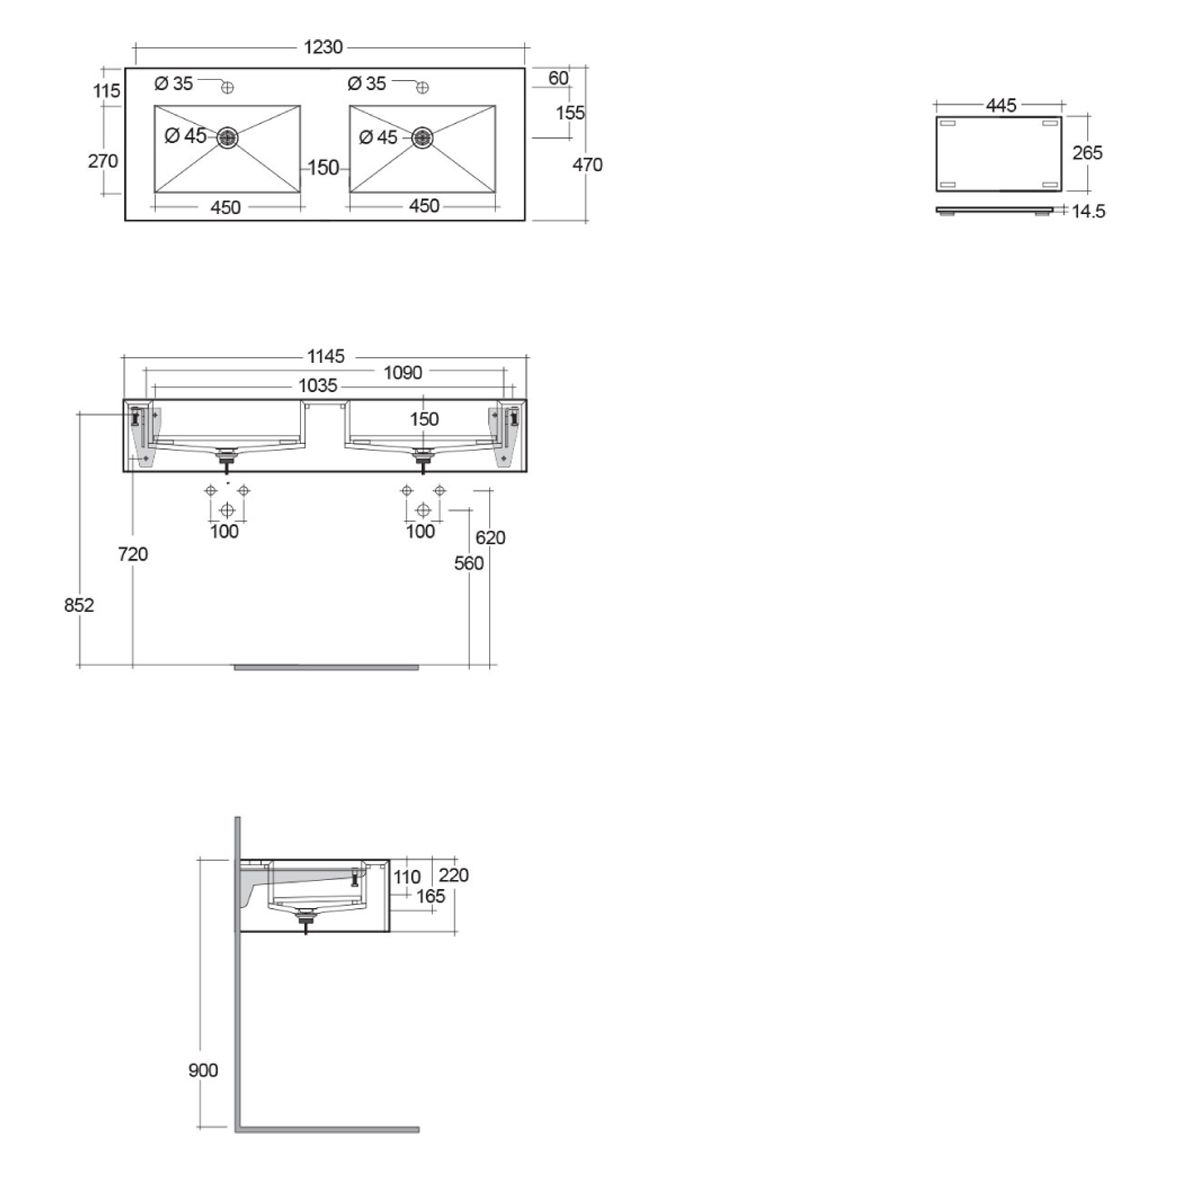 RAK Precious Behind Grey Wall Hung Counter Basin 1200mm with Brackets Measurements